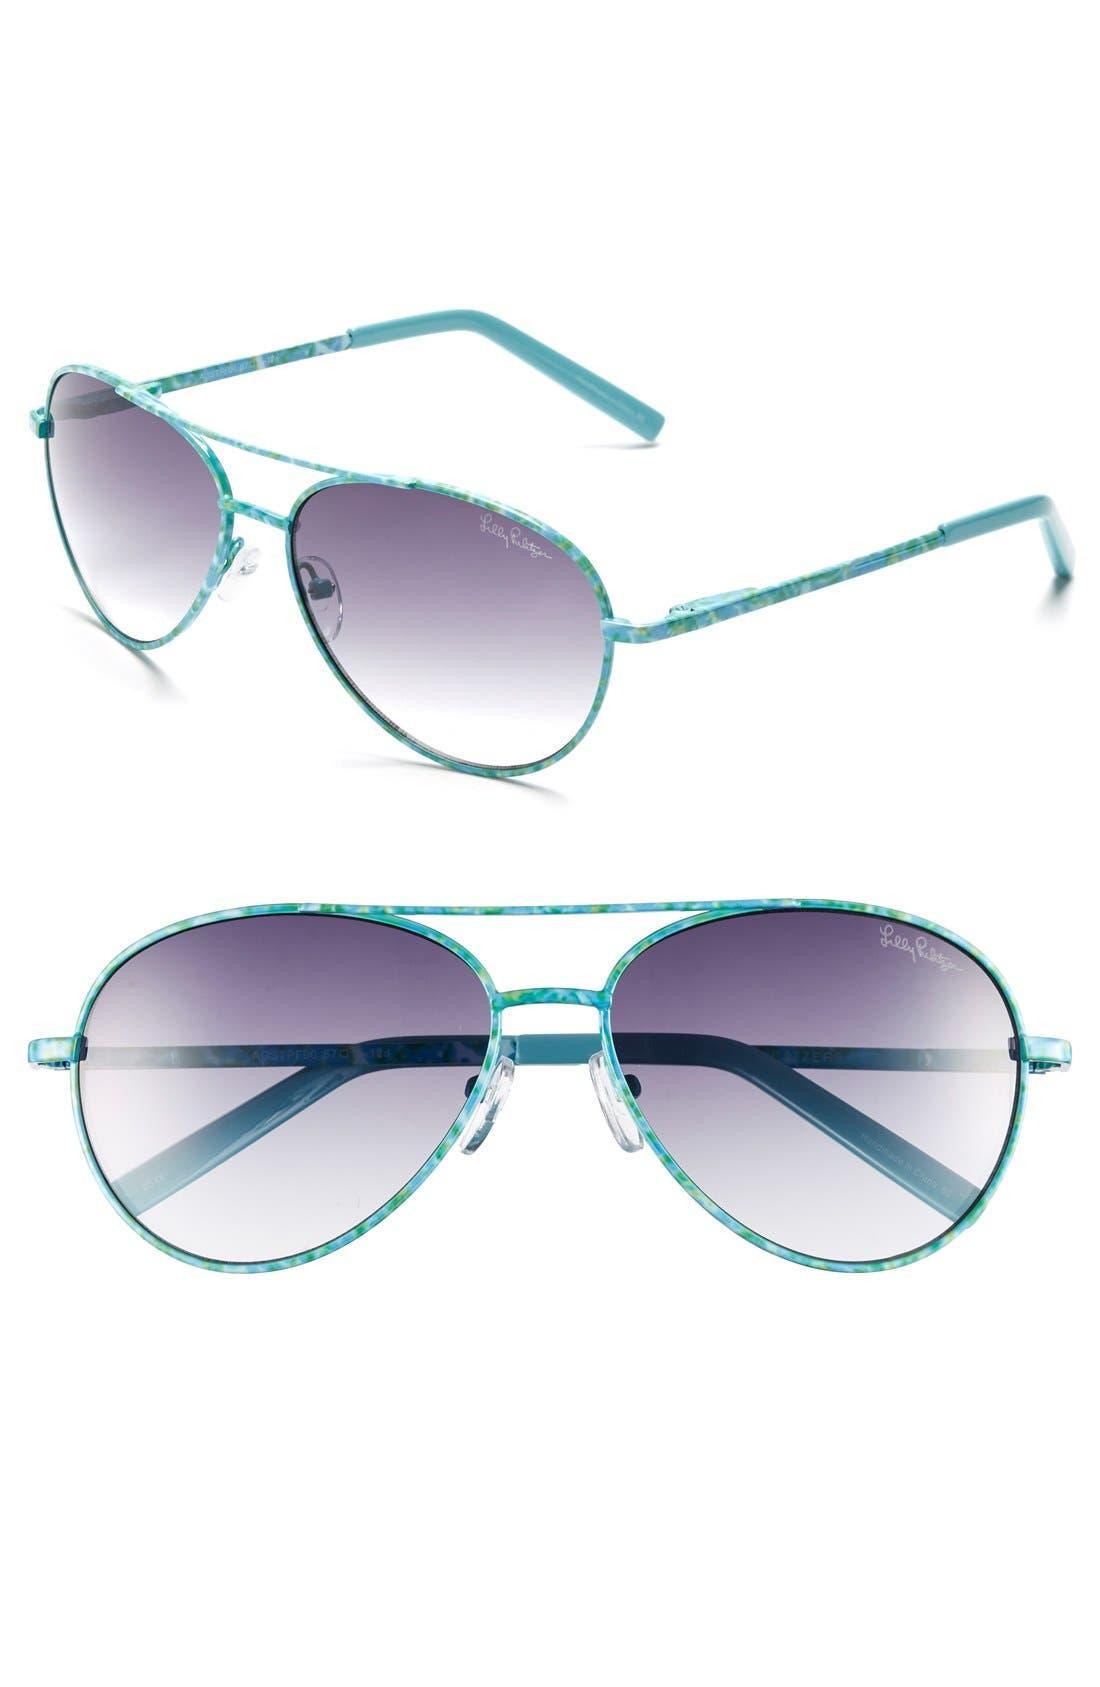 Main Image - Lilly Pulitzer® 'Augusta' 57mm Sunglasses